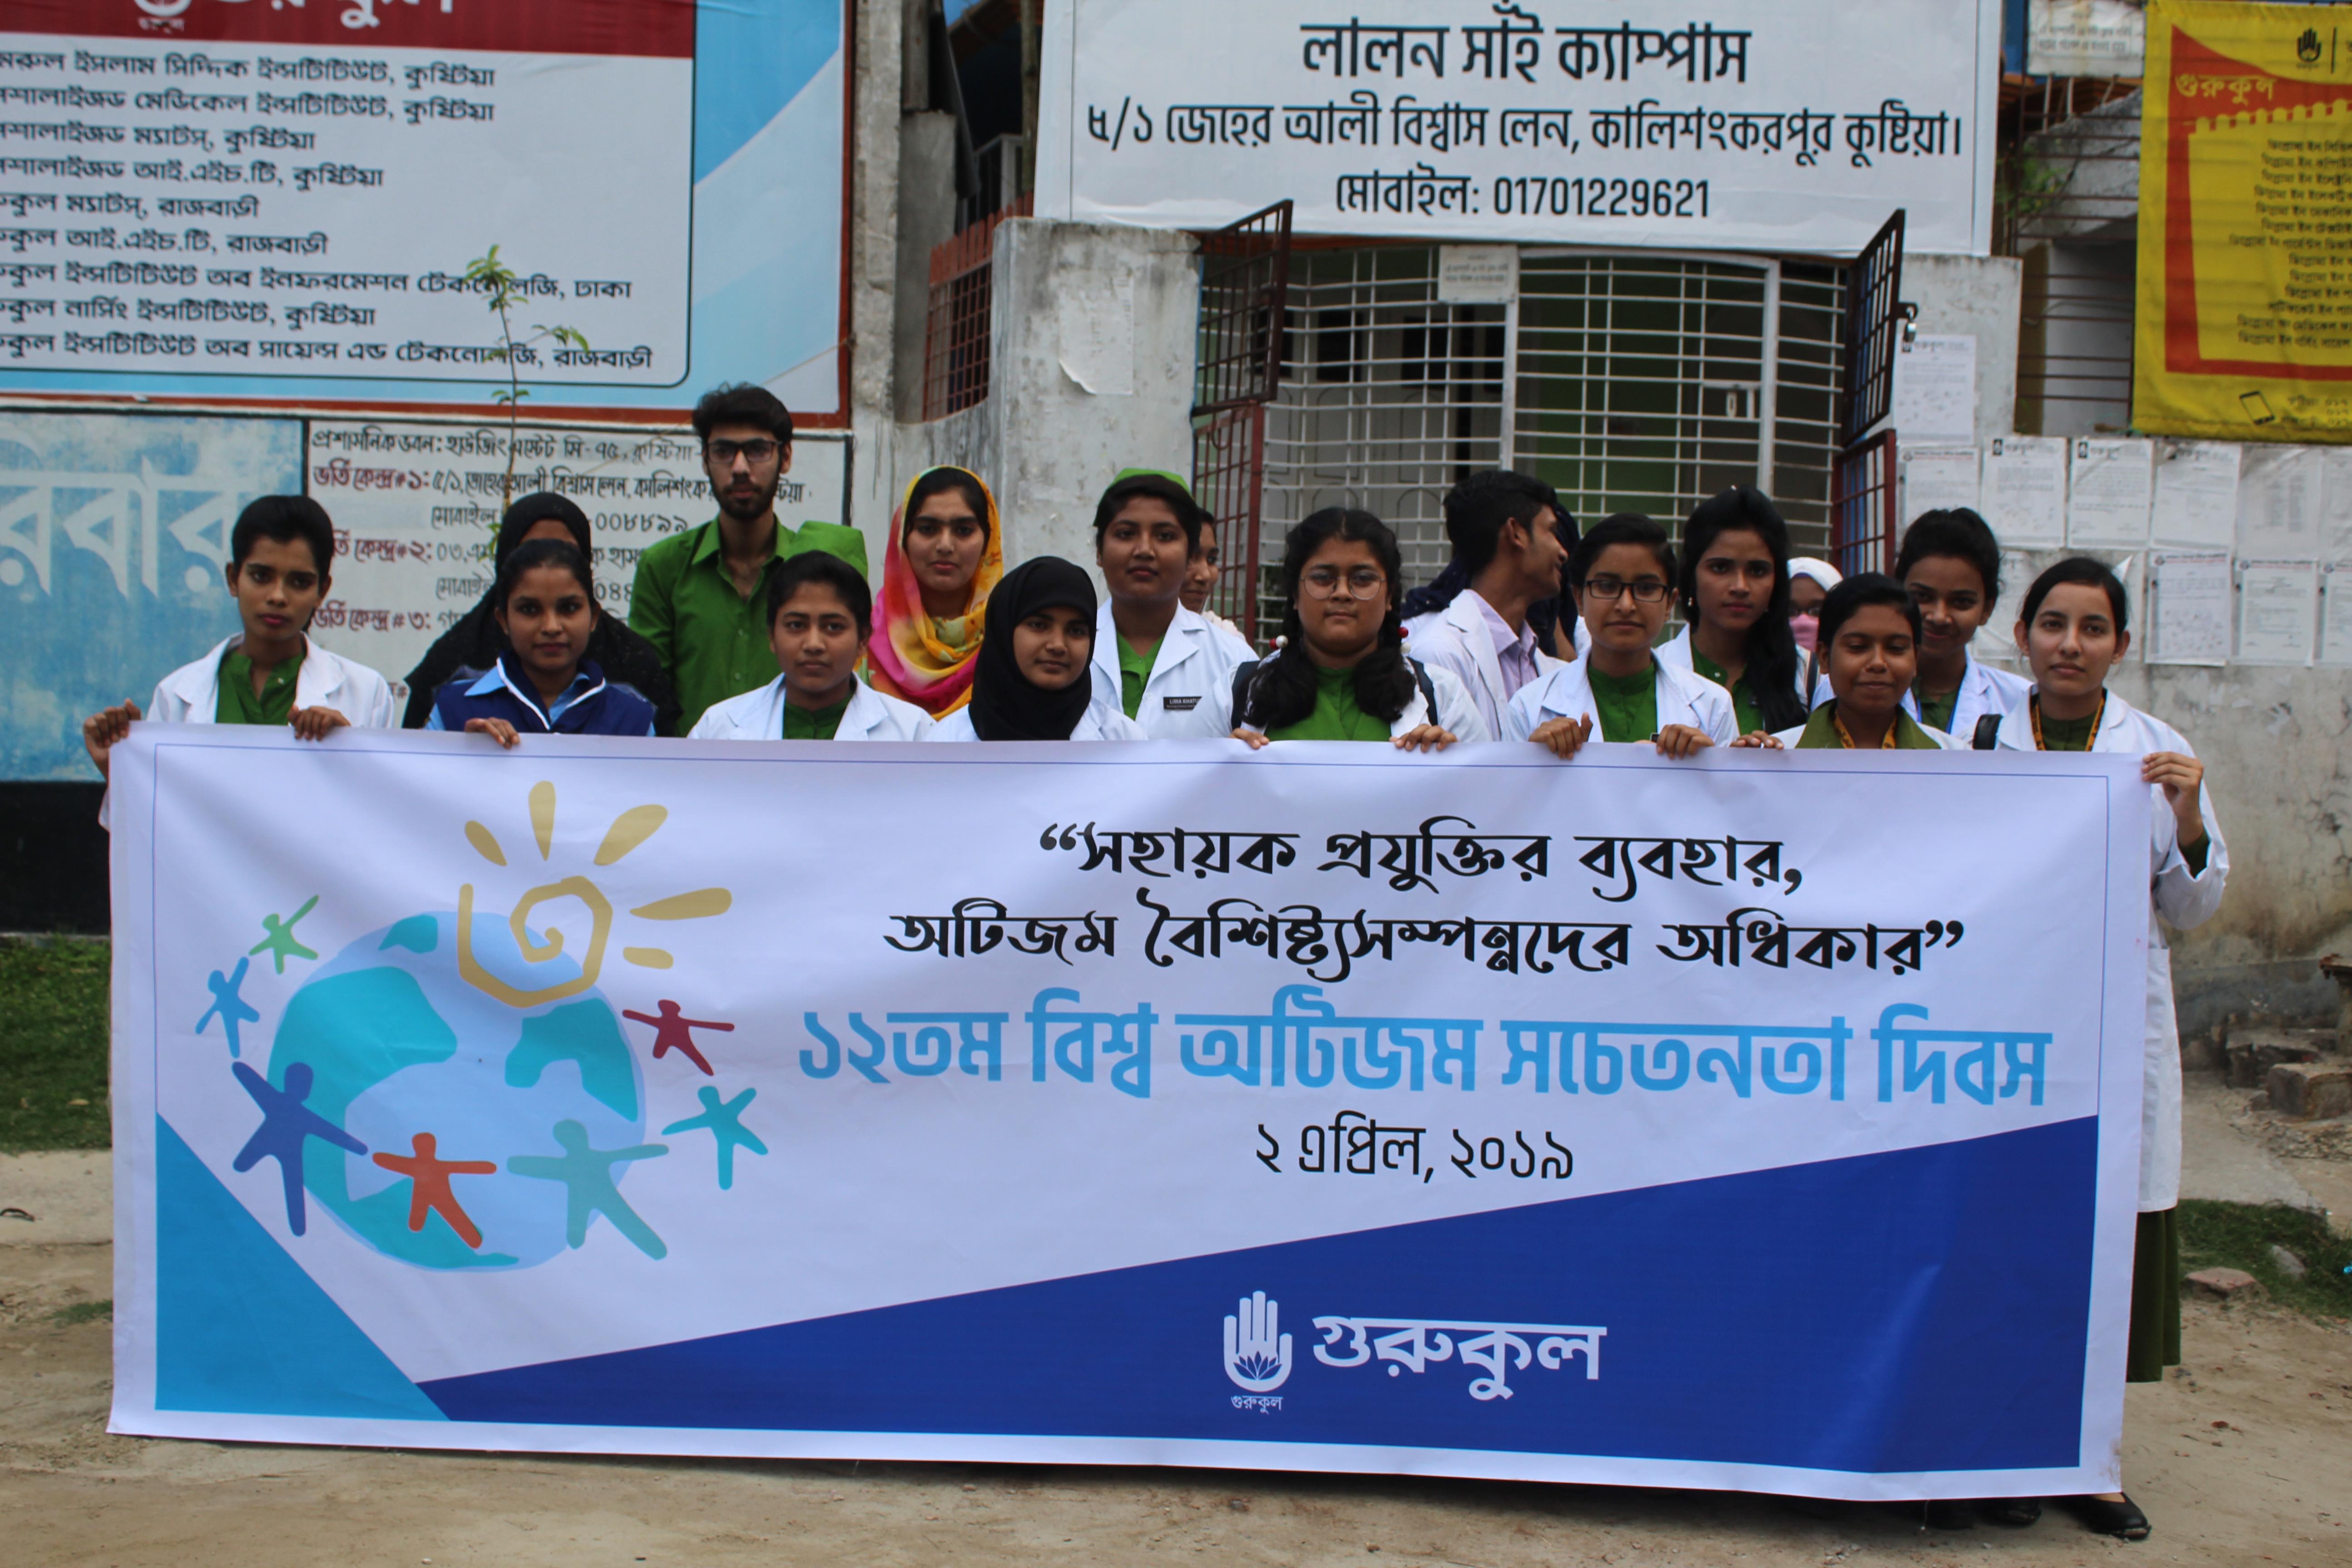 Celebrating Autism Awareness Day in Gurukul-গুরুকুলে অটিজম সচেতনতা দিবস উদযাপন